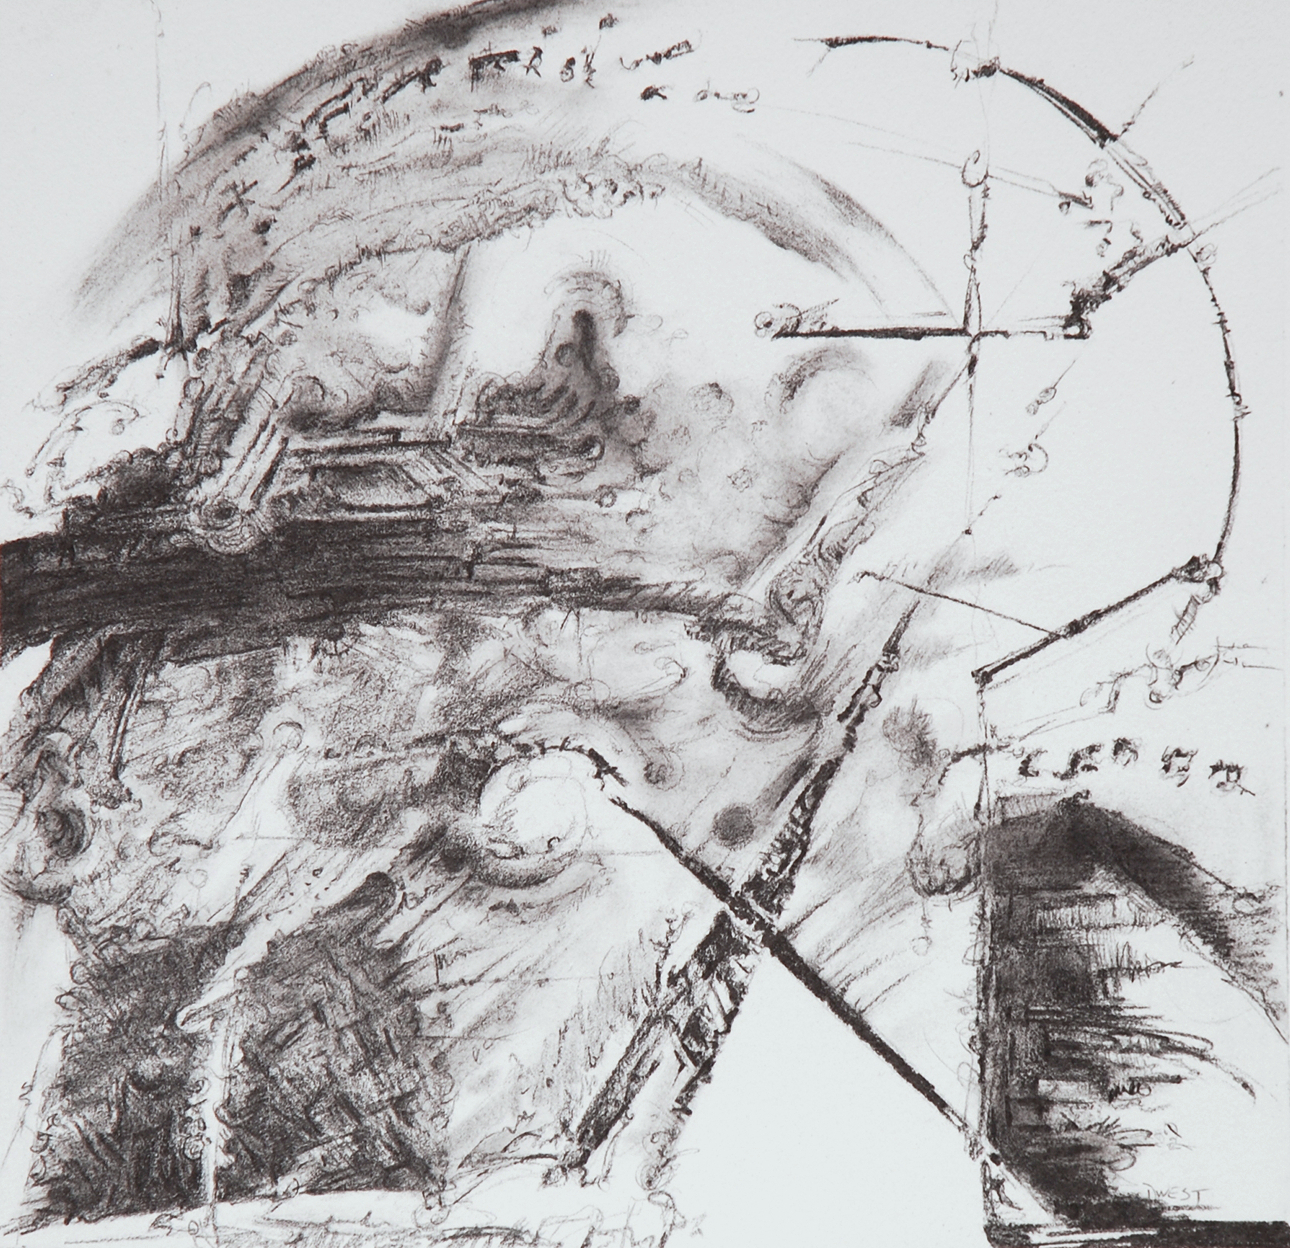 "Intercession III, 12"" x 12"", Graphite on Rives, 2013"